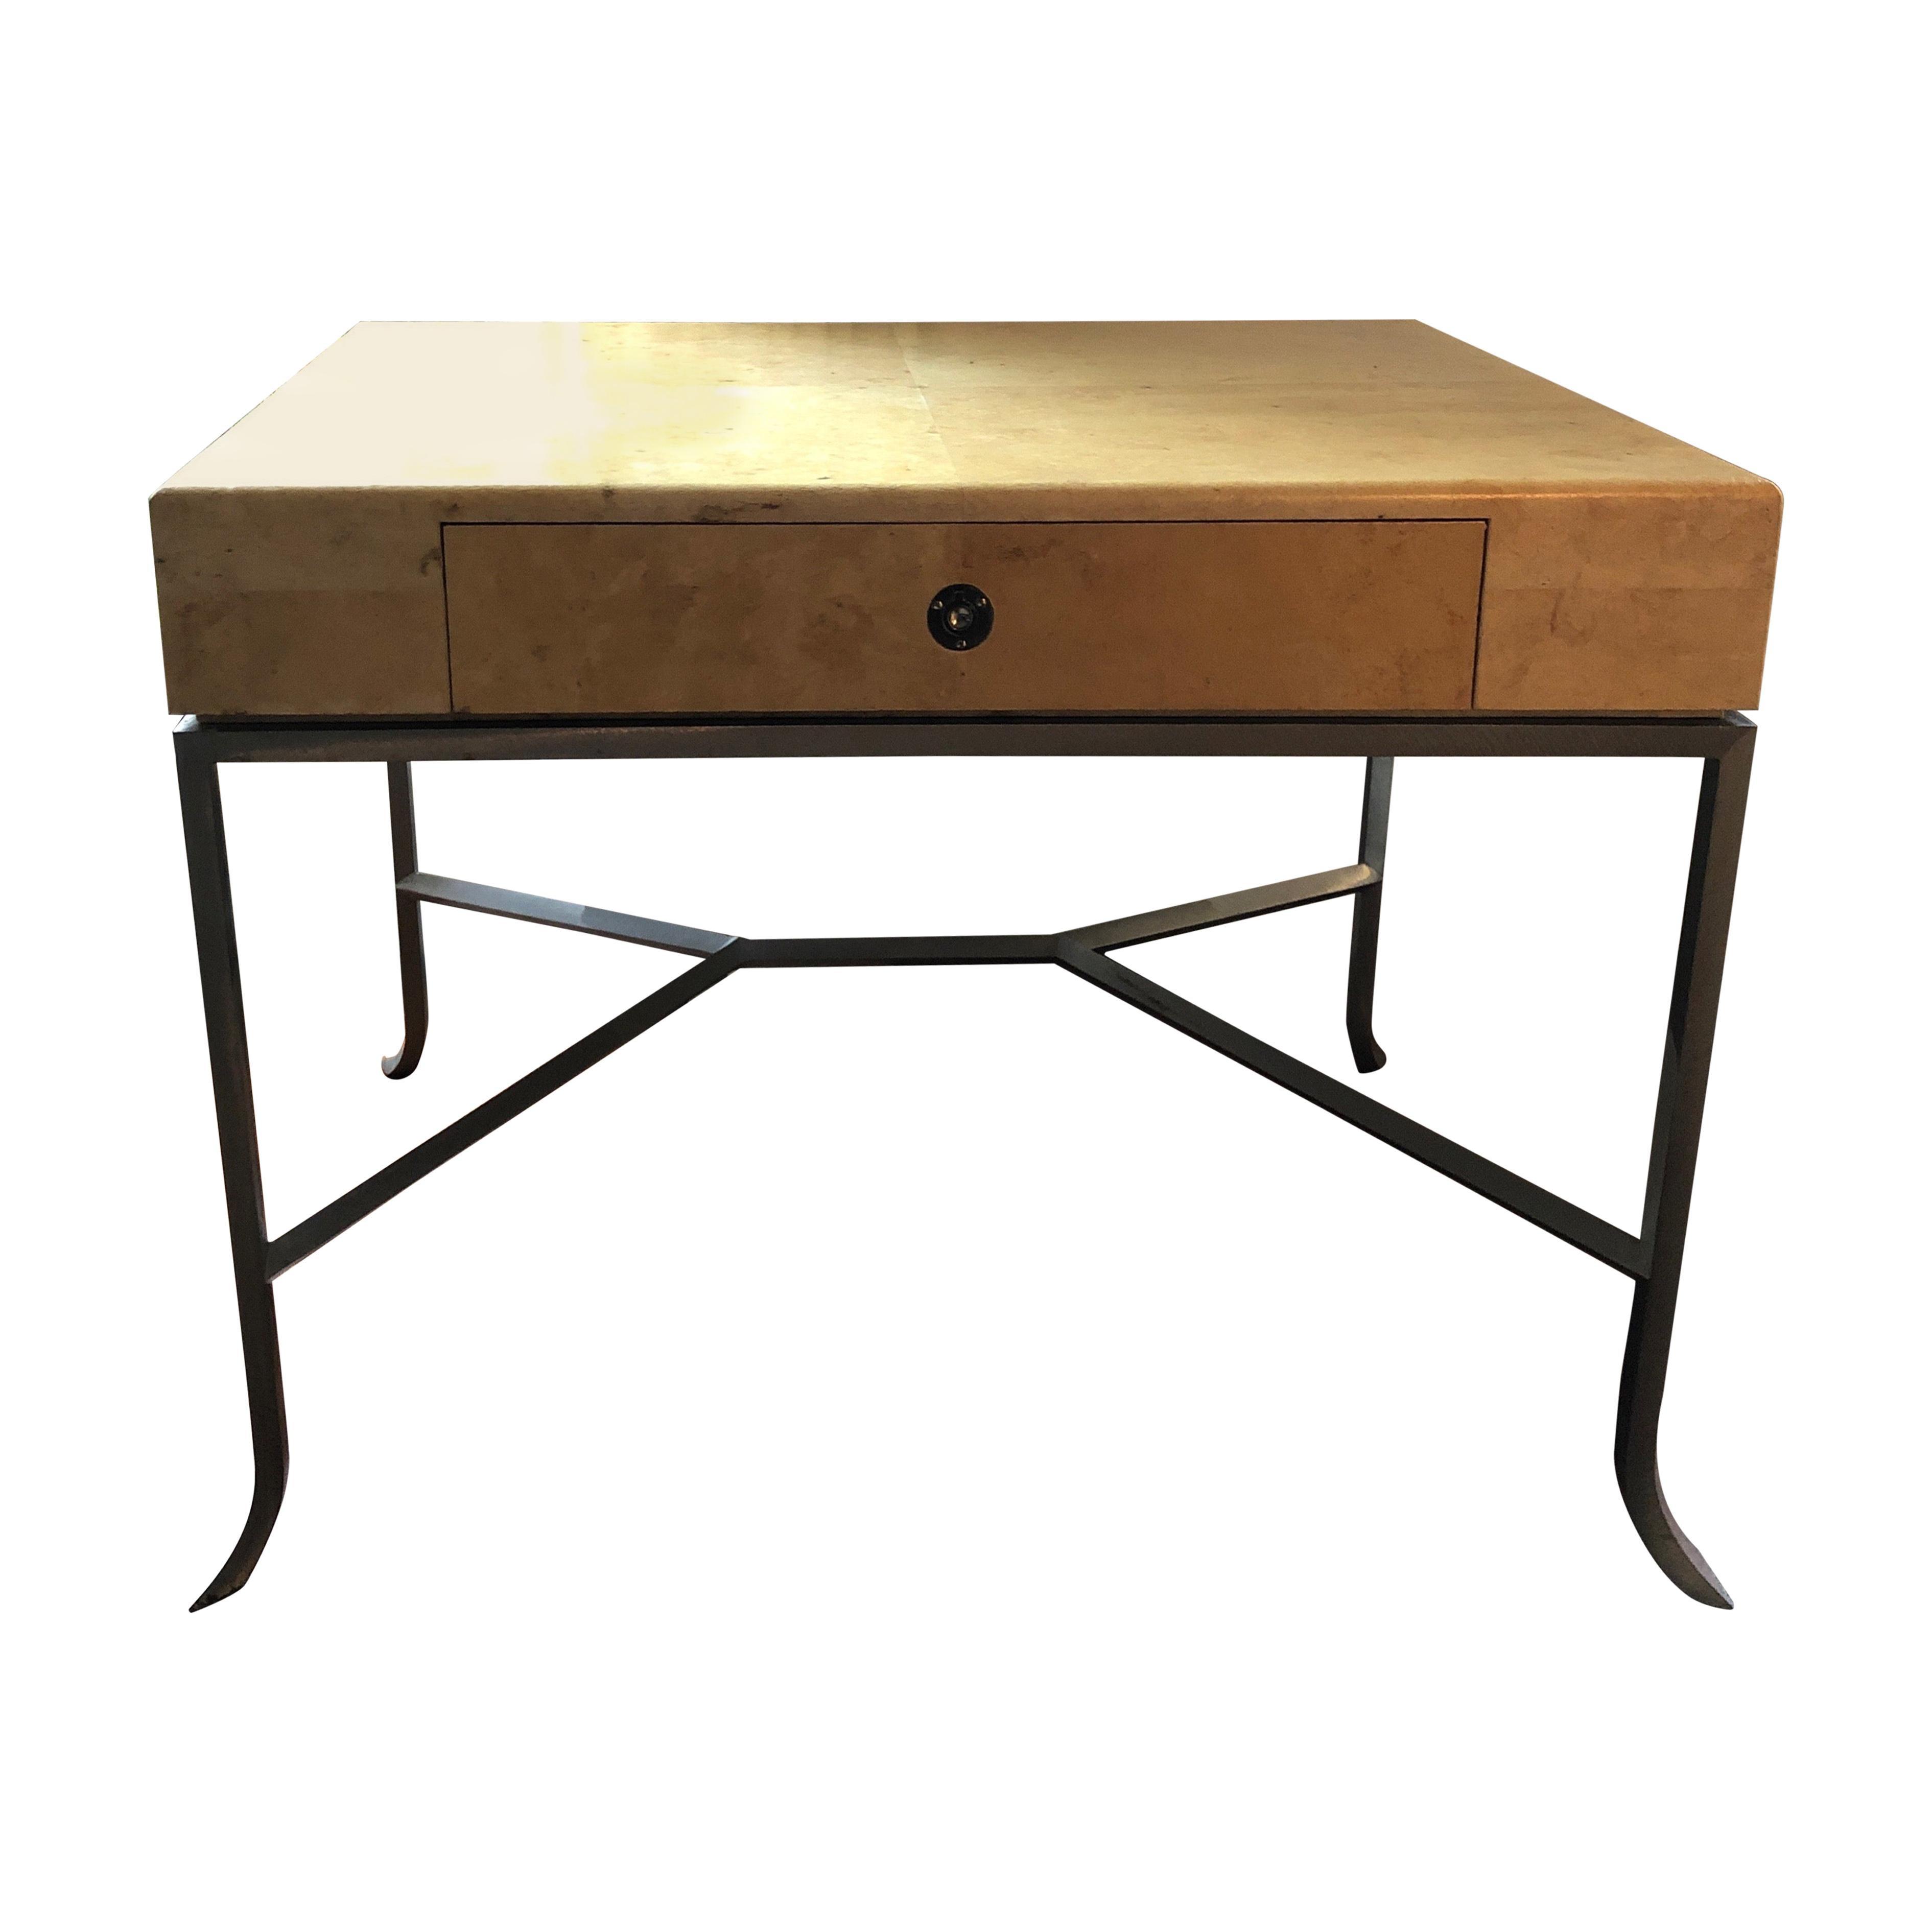 Karl Springer Style Art Deco Parchment Side Table